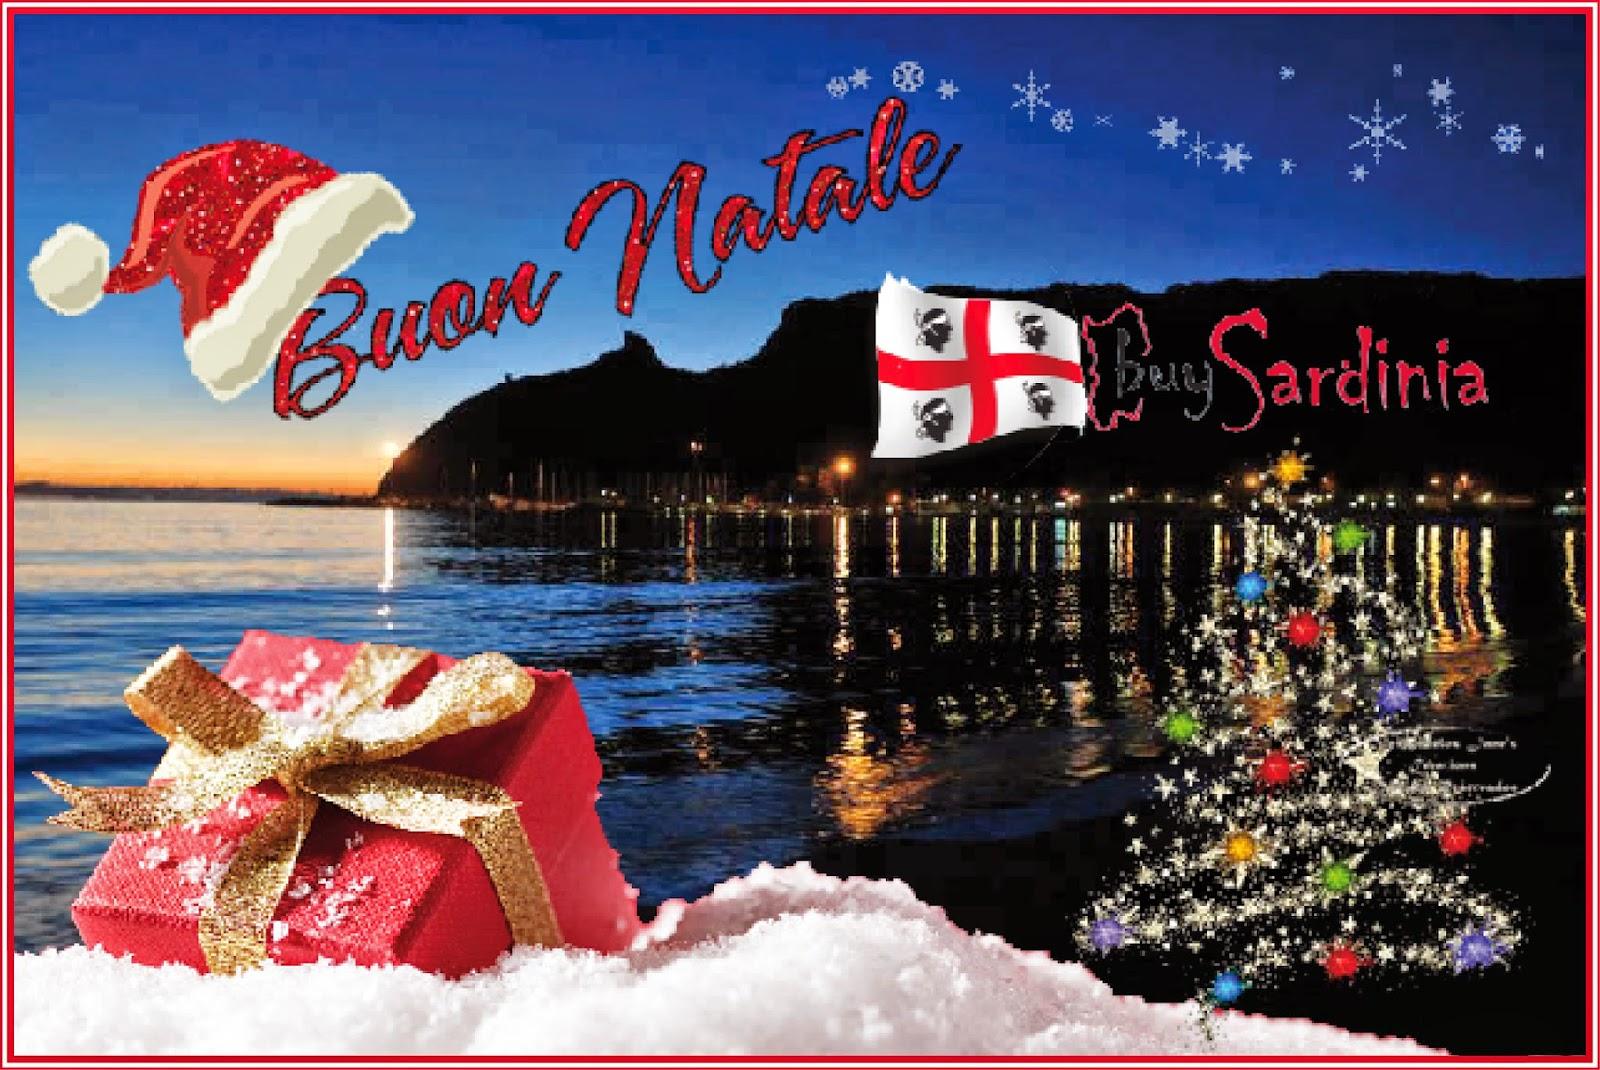 Tanti auguri di Buon Natale da buySardinia